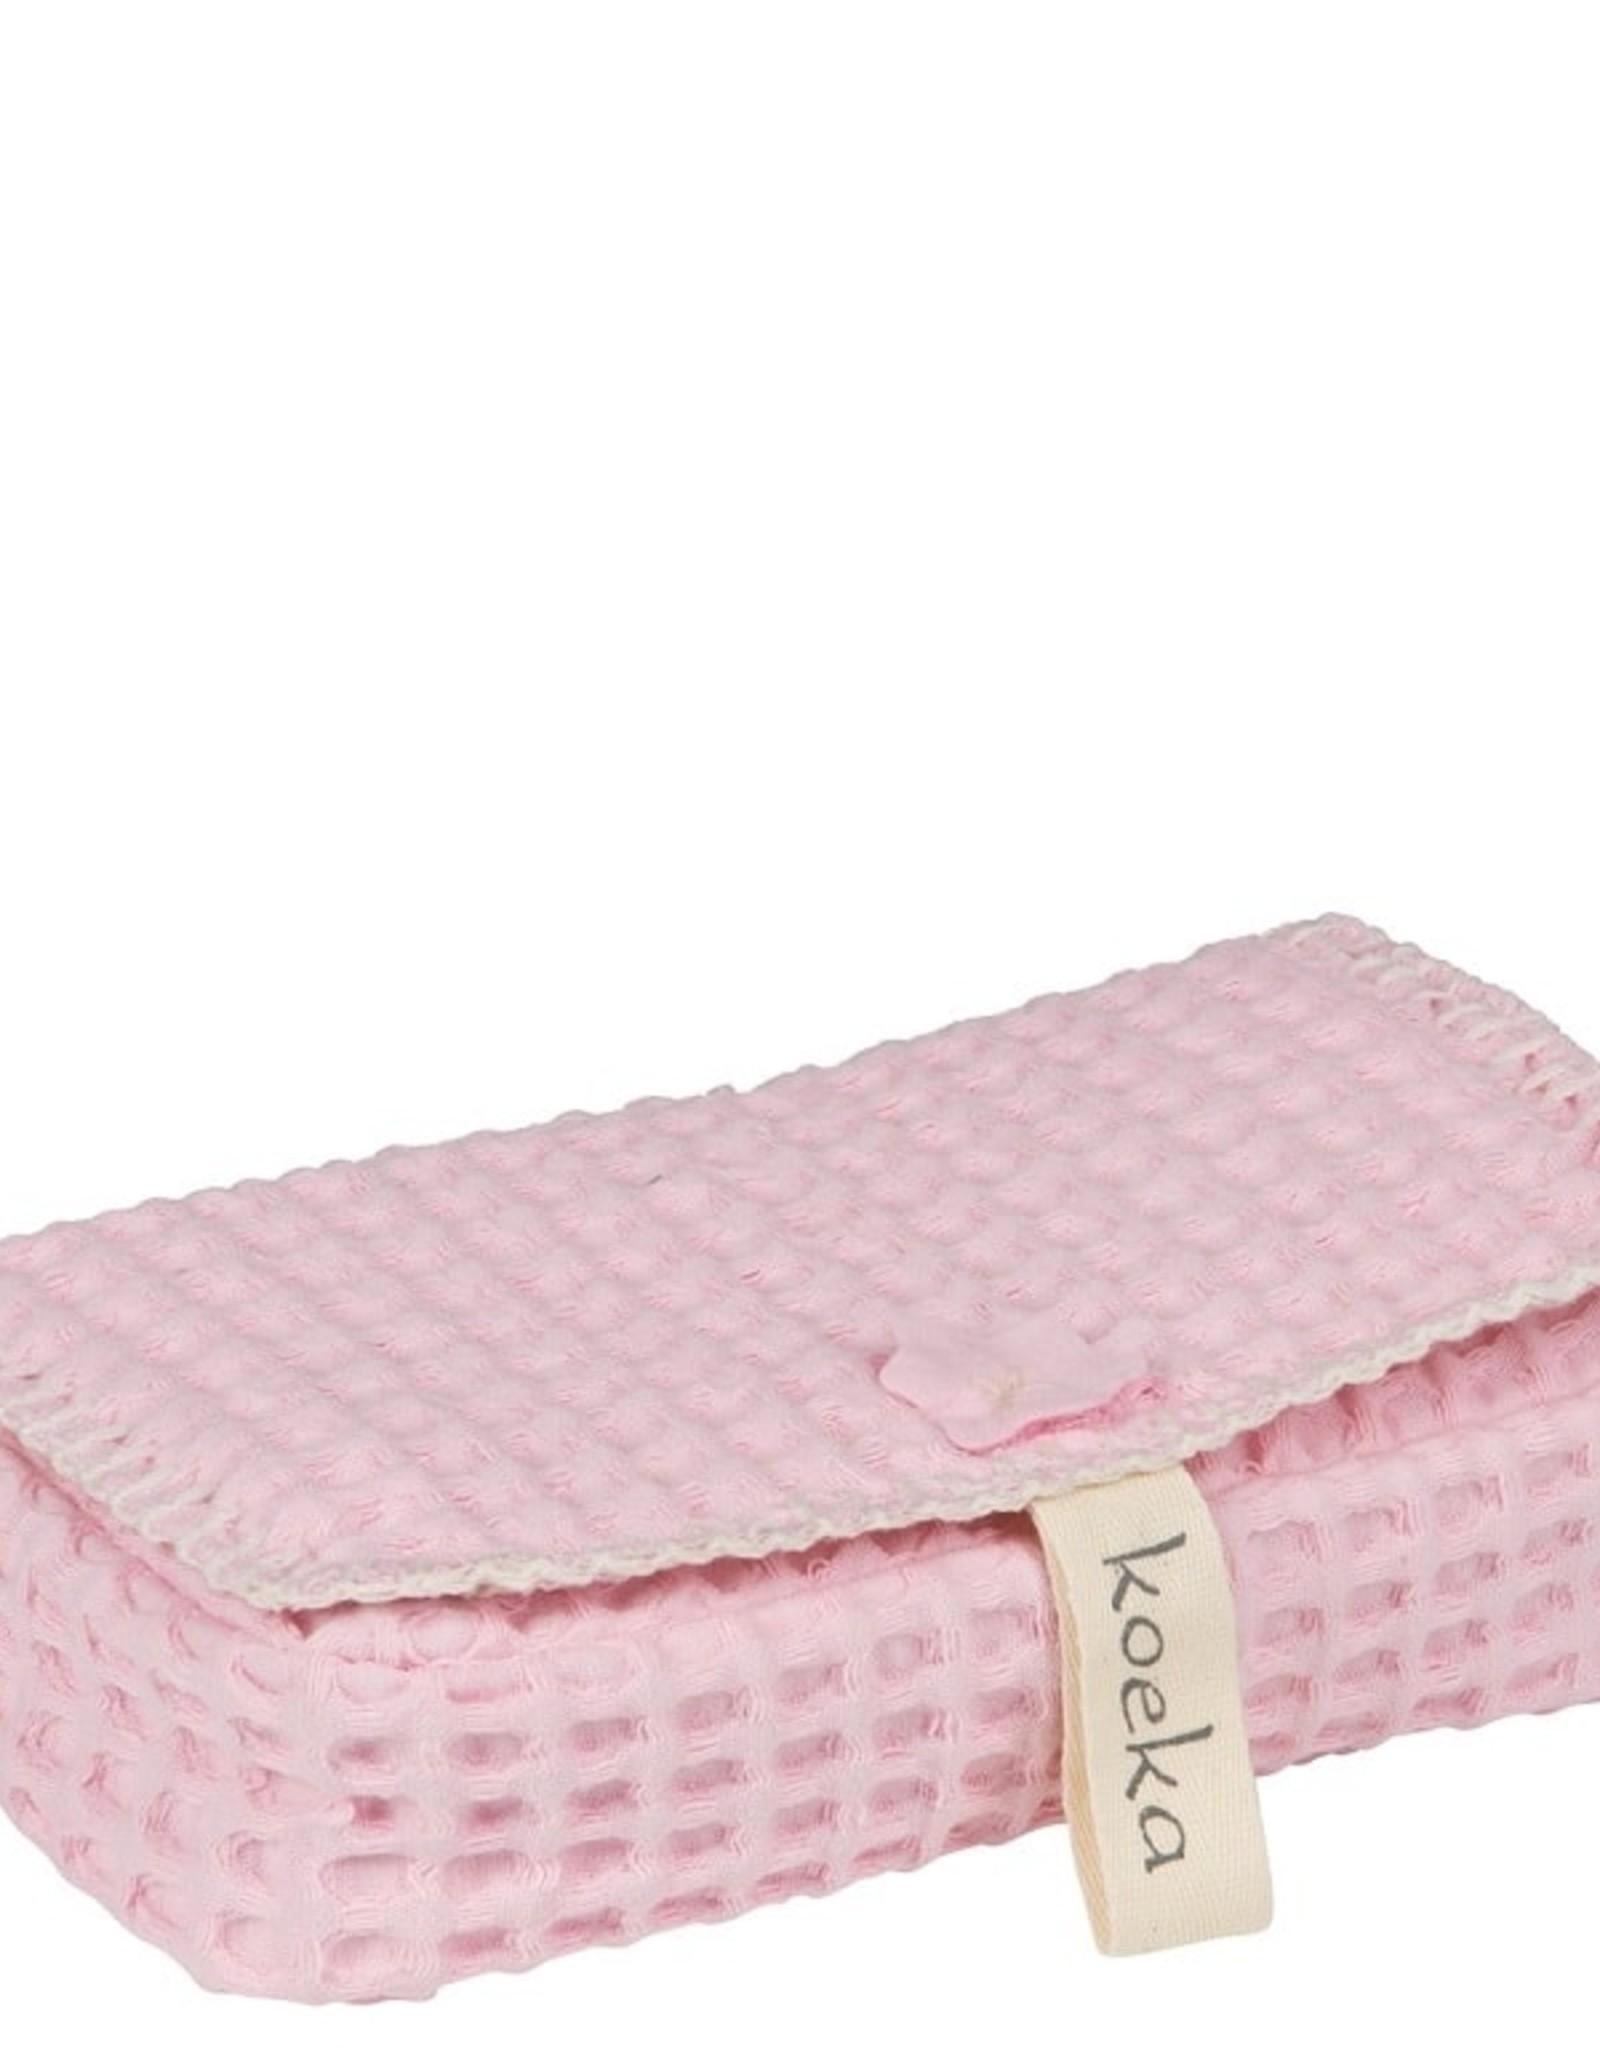 Koeka Koeka Hoes voor Babydoekjes Antwerp Wafel Old Baby Pink